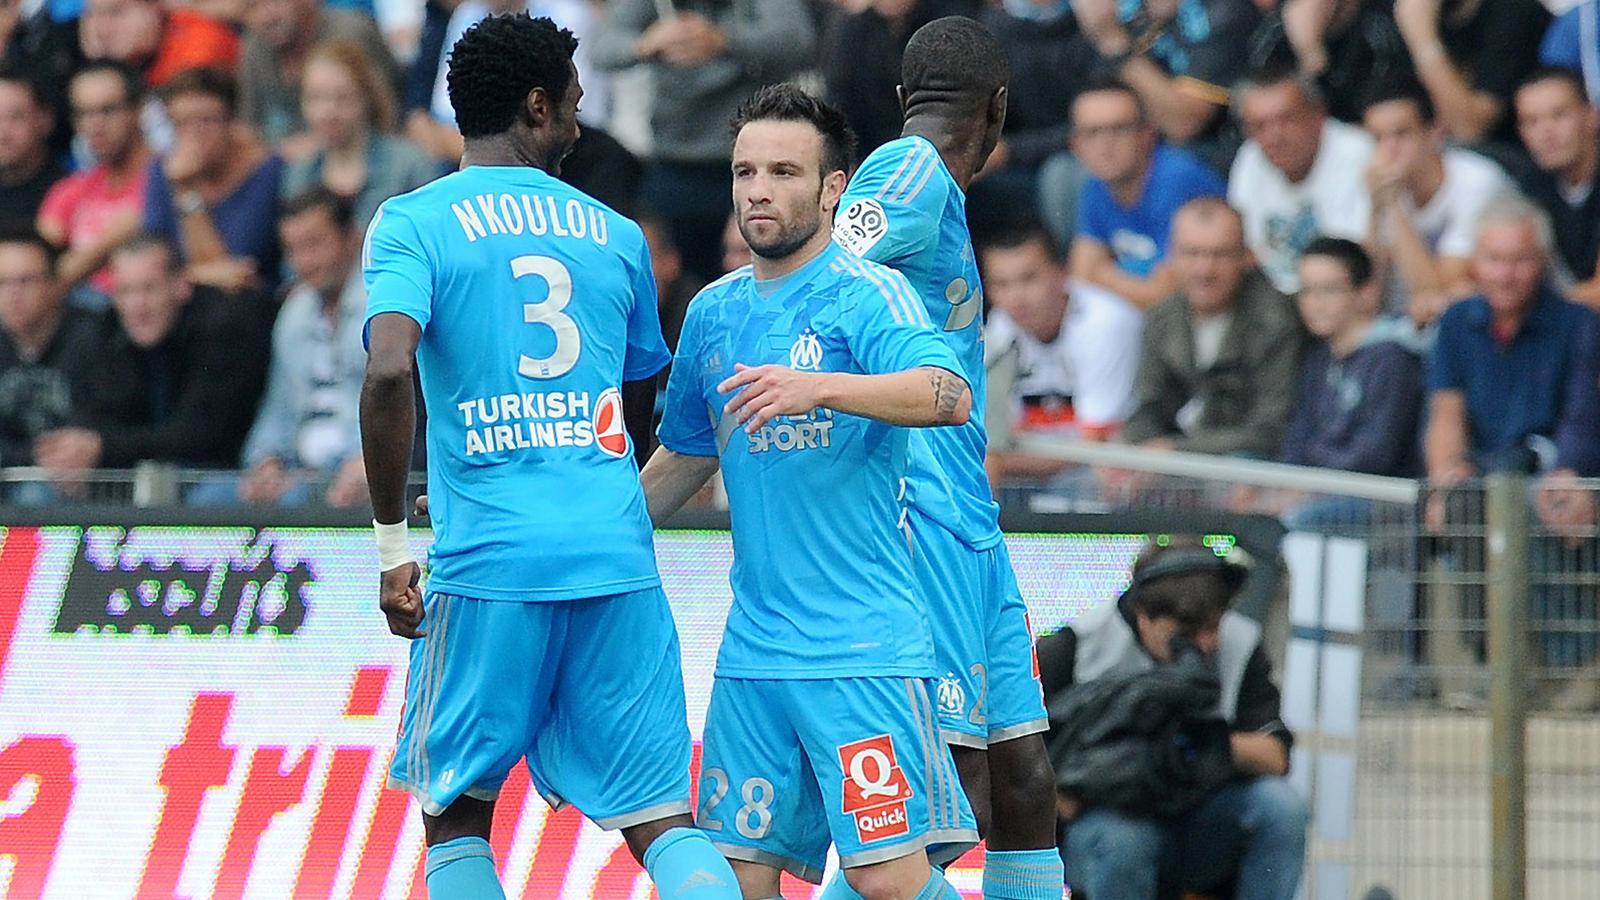 OM - Match Olympique de Marseille - Willem II en direct live streaming